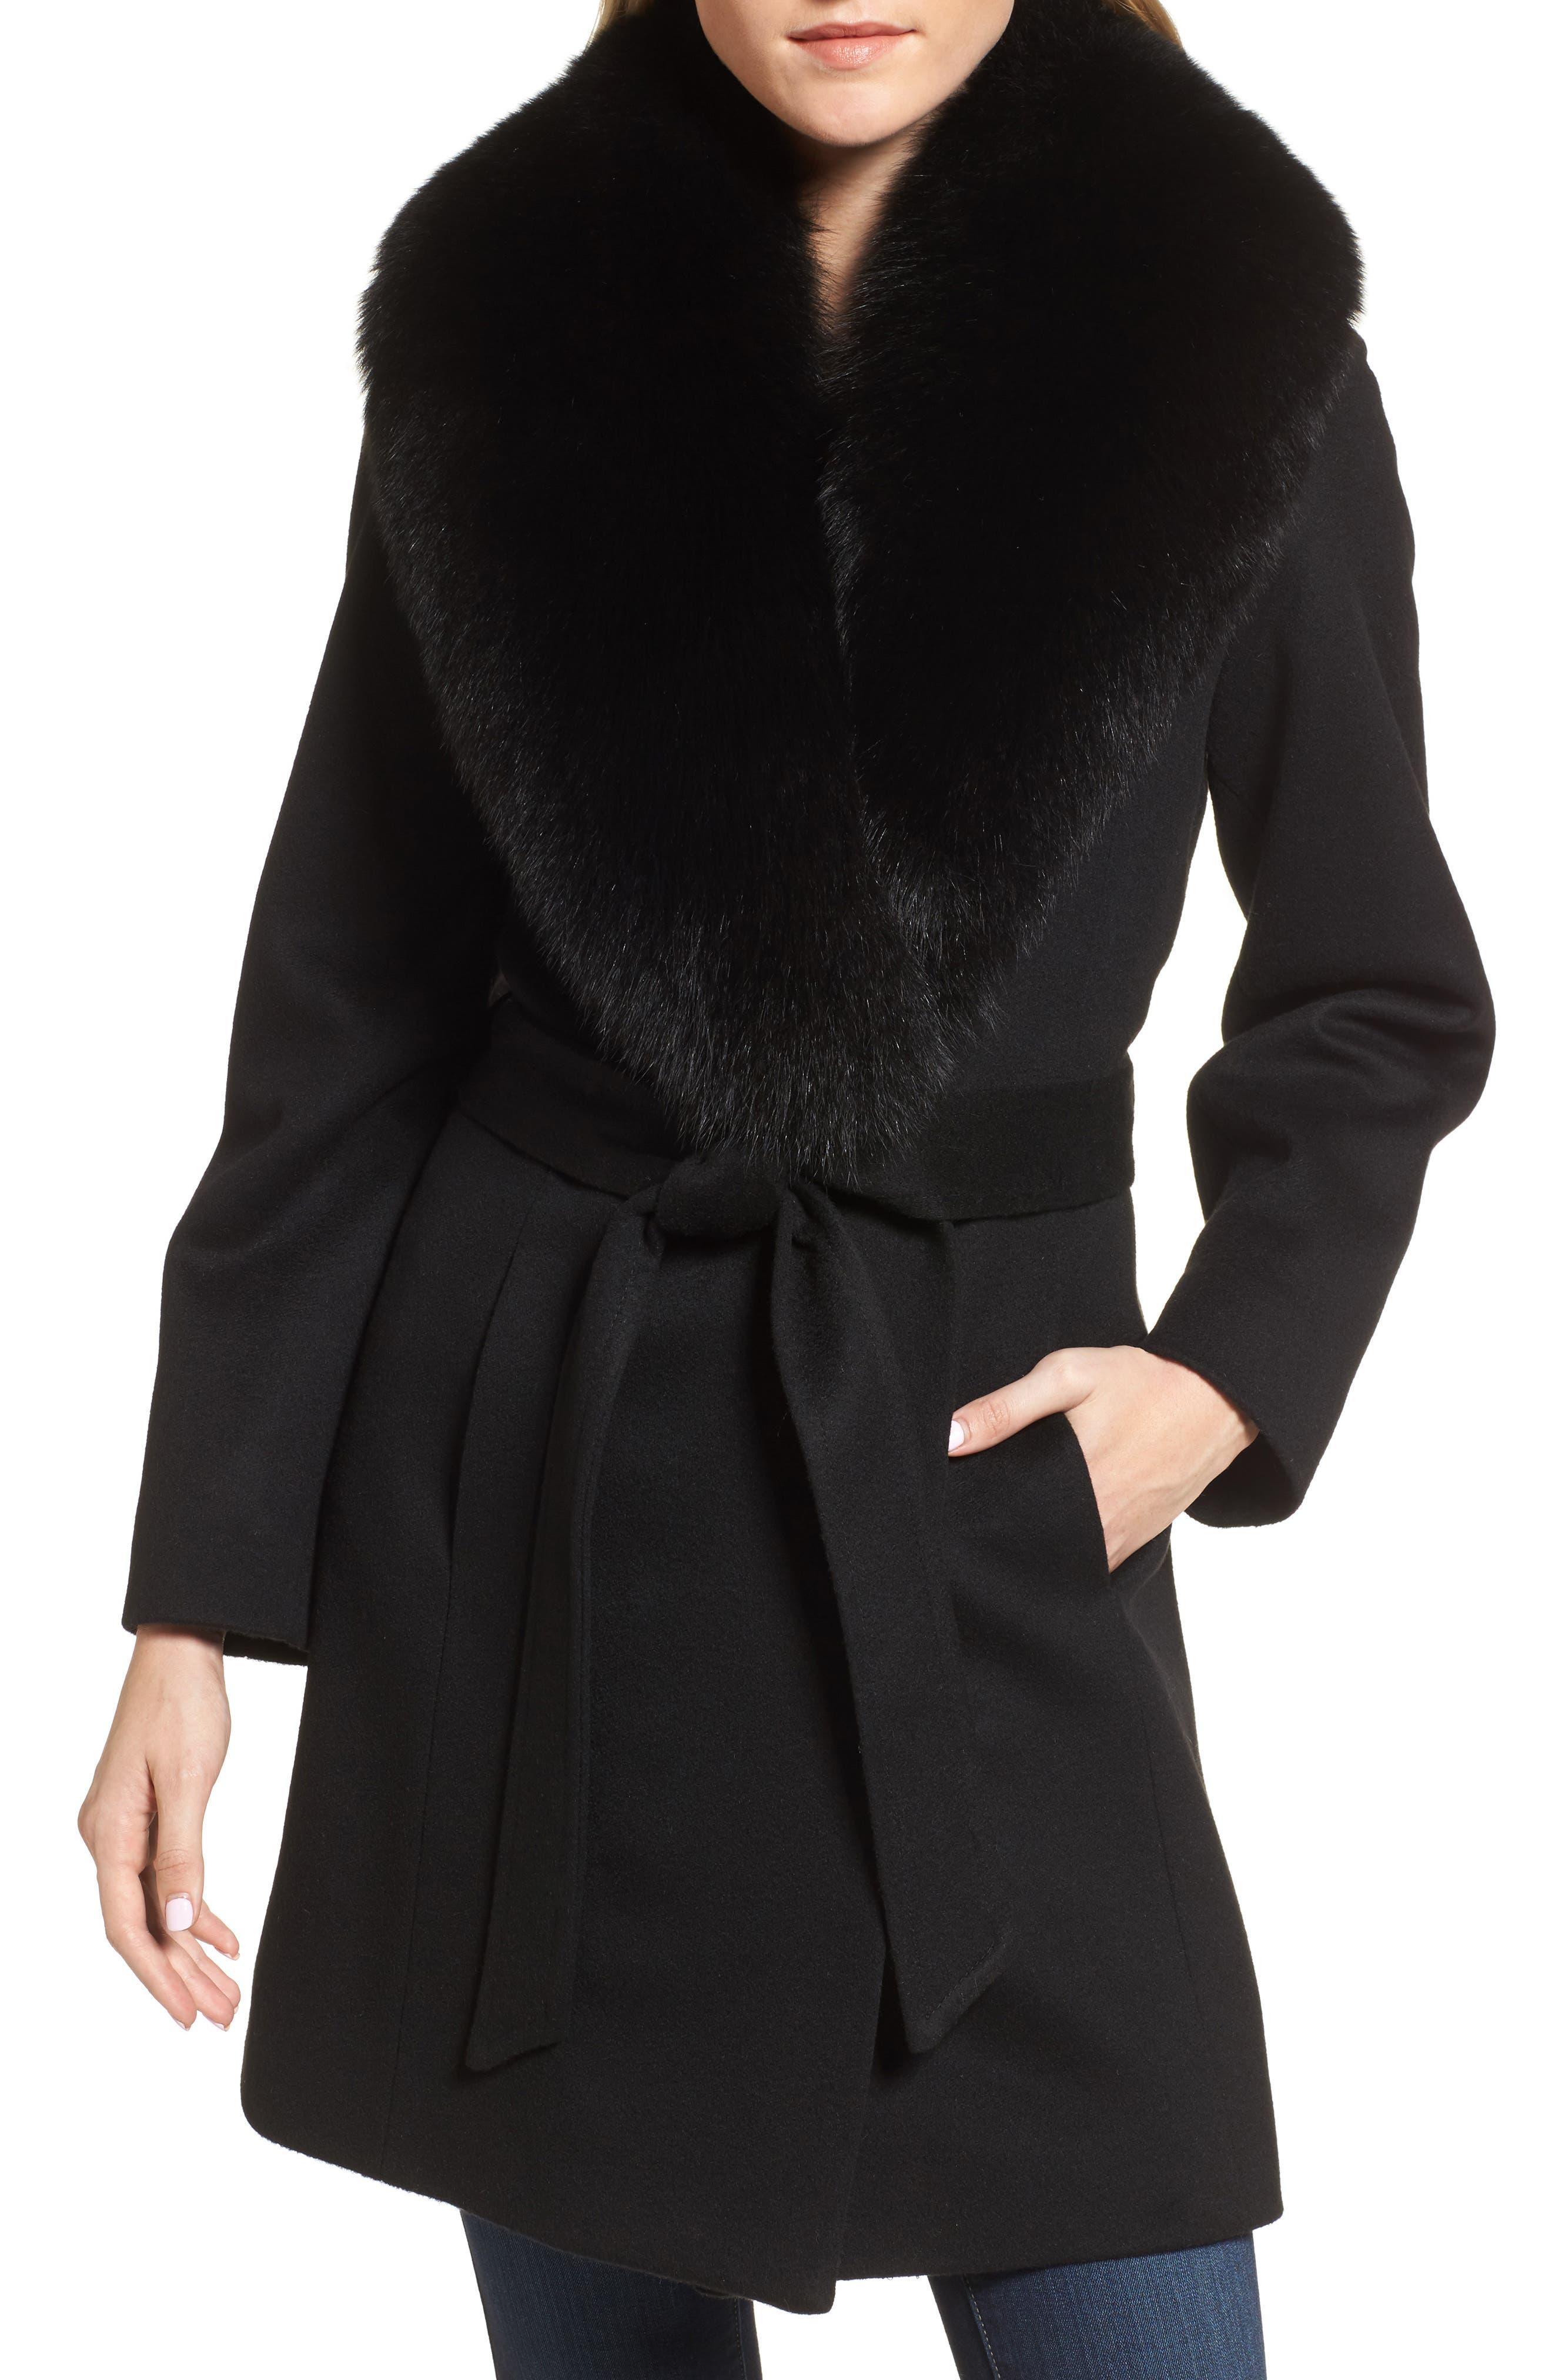 Sofia Cashmere Genuine Fox Fur Lapel Wool & Cashmere Wrap Coat